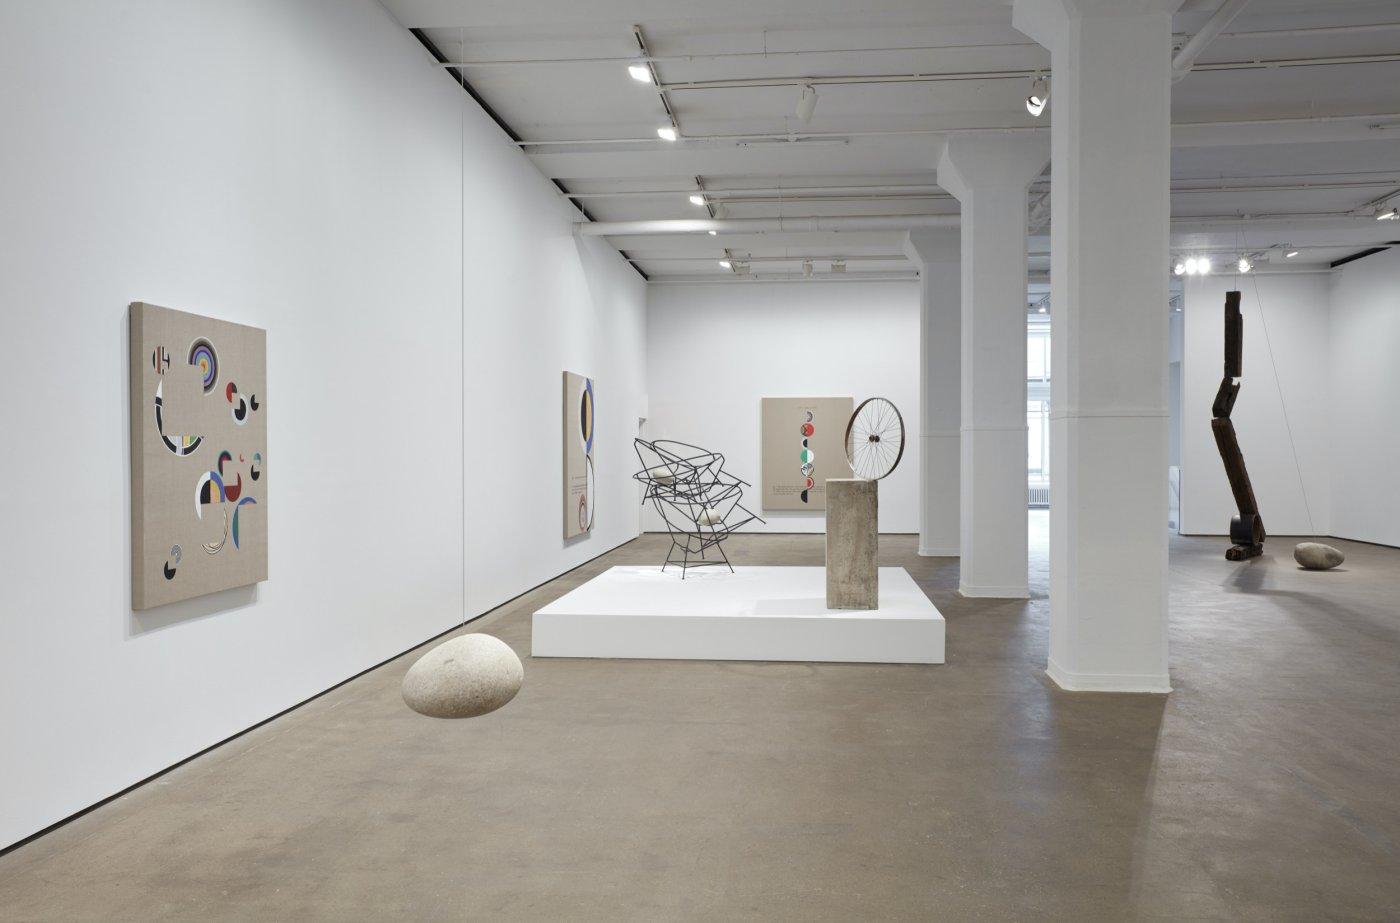 Sean Kelly Gallery Jose Davila 8